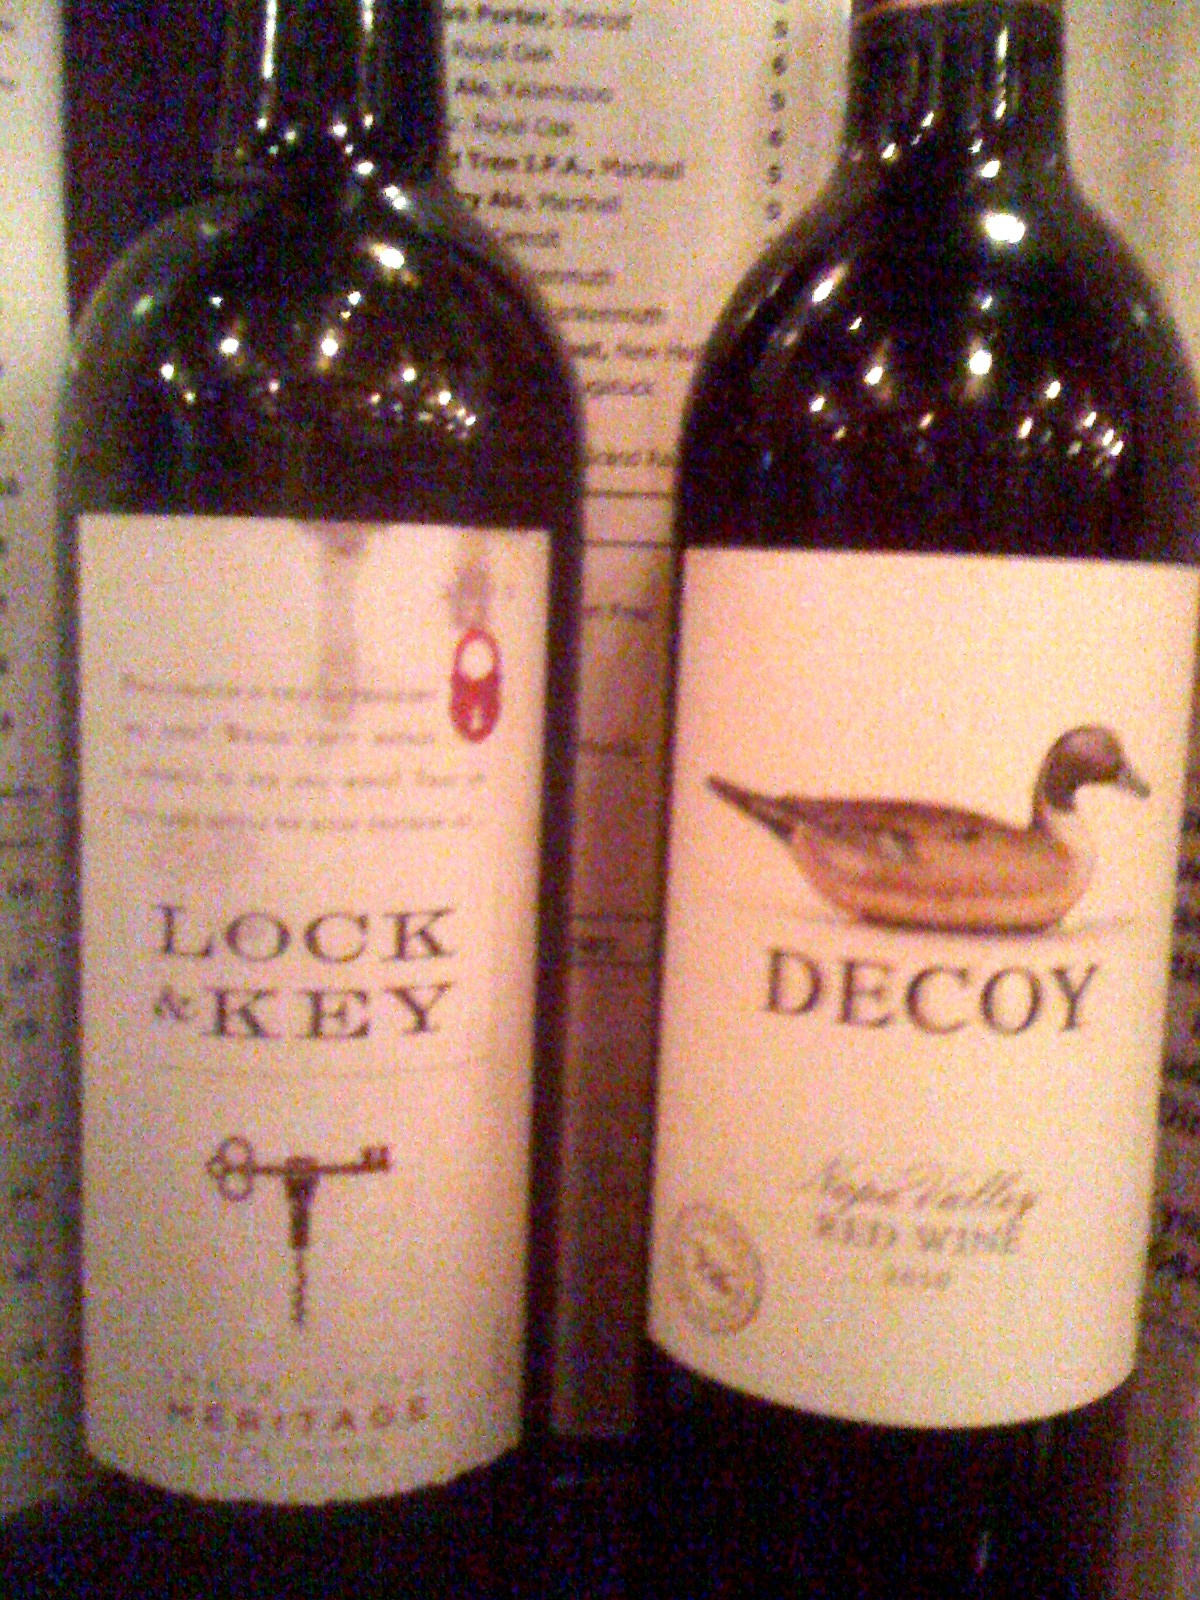 Lock and key wine